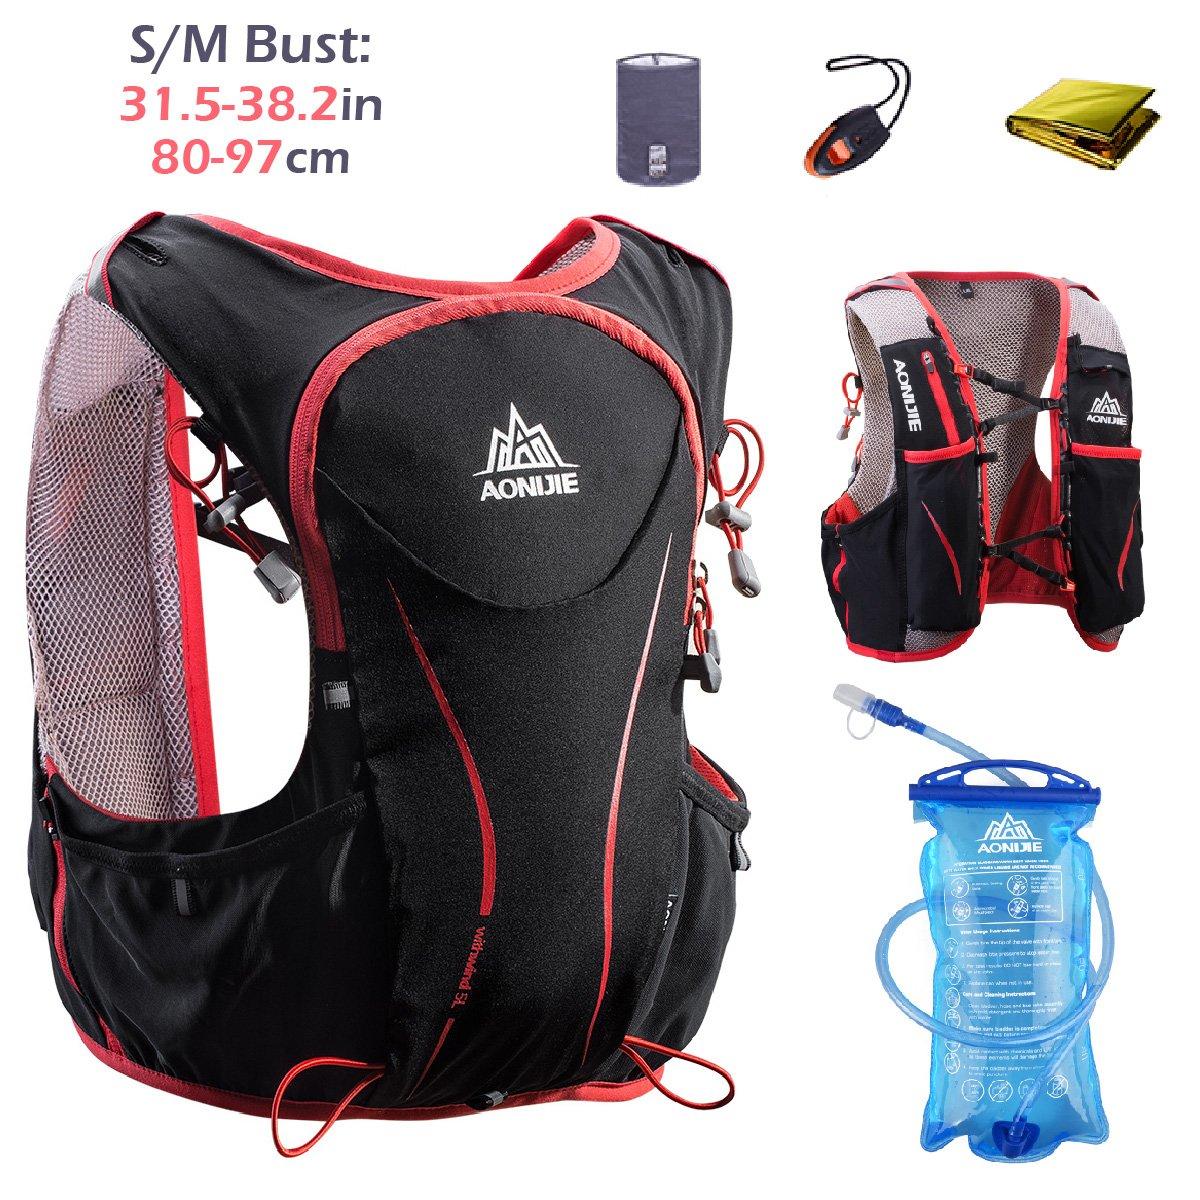 TRIWONDER Hydration Pack Backpack 5L Lightweight Deluxe Marathoner Running Race Hydration Vest